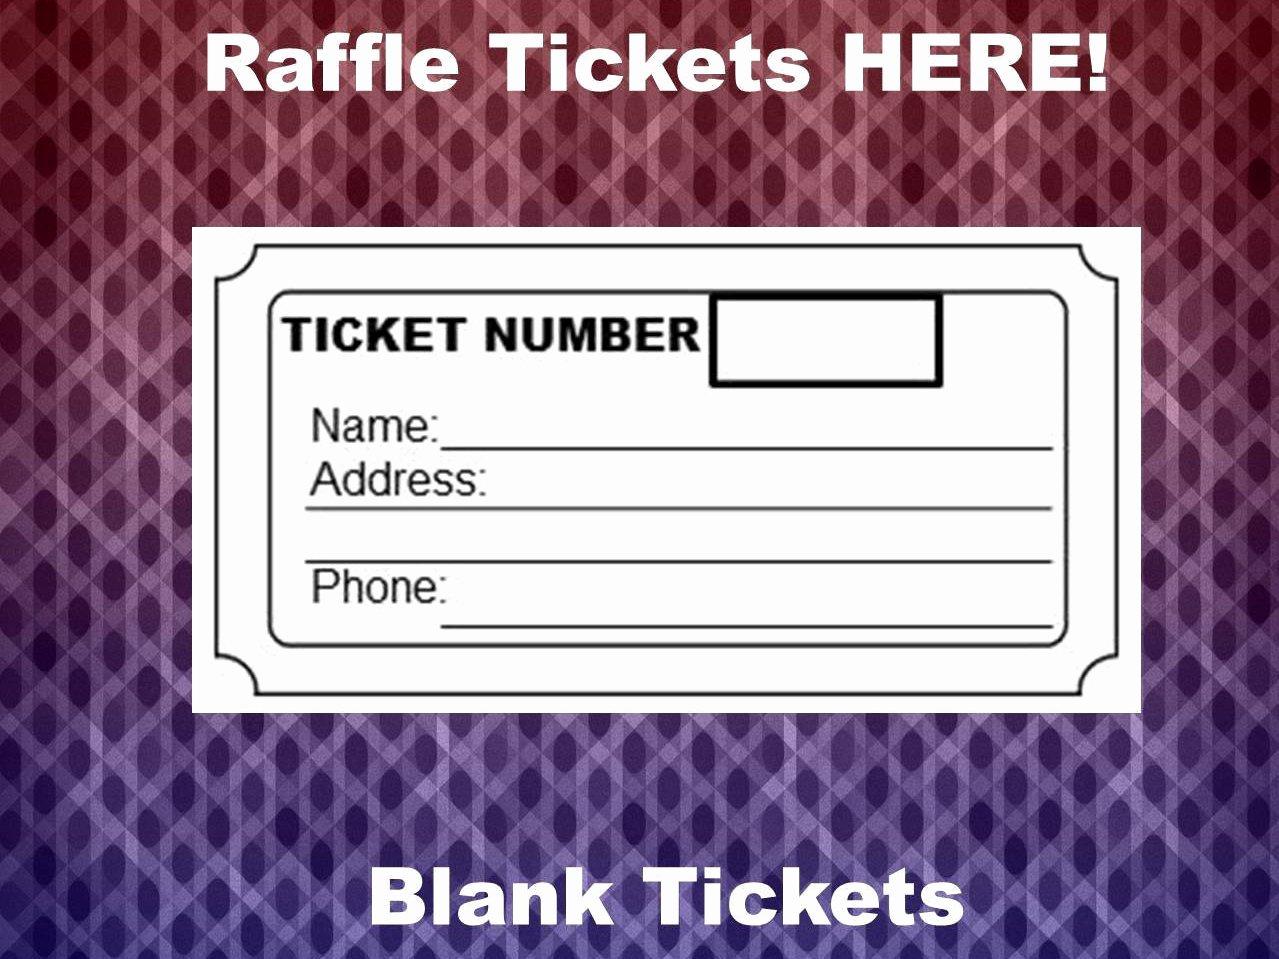 Blank Raffle Ticket Template New Raffle Ticket Template 8 Blank Raffle Tickets Per Page Party